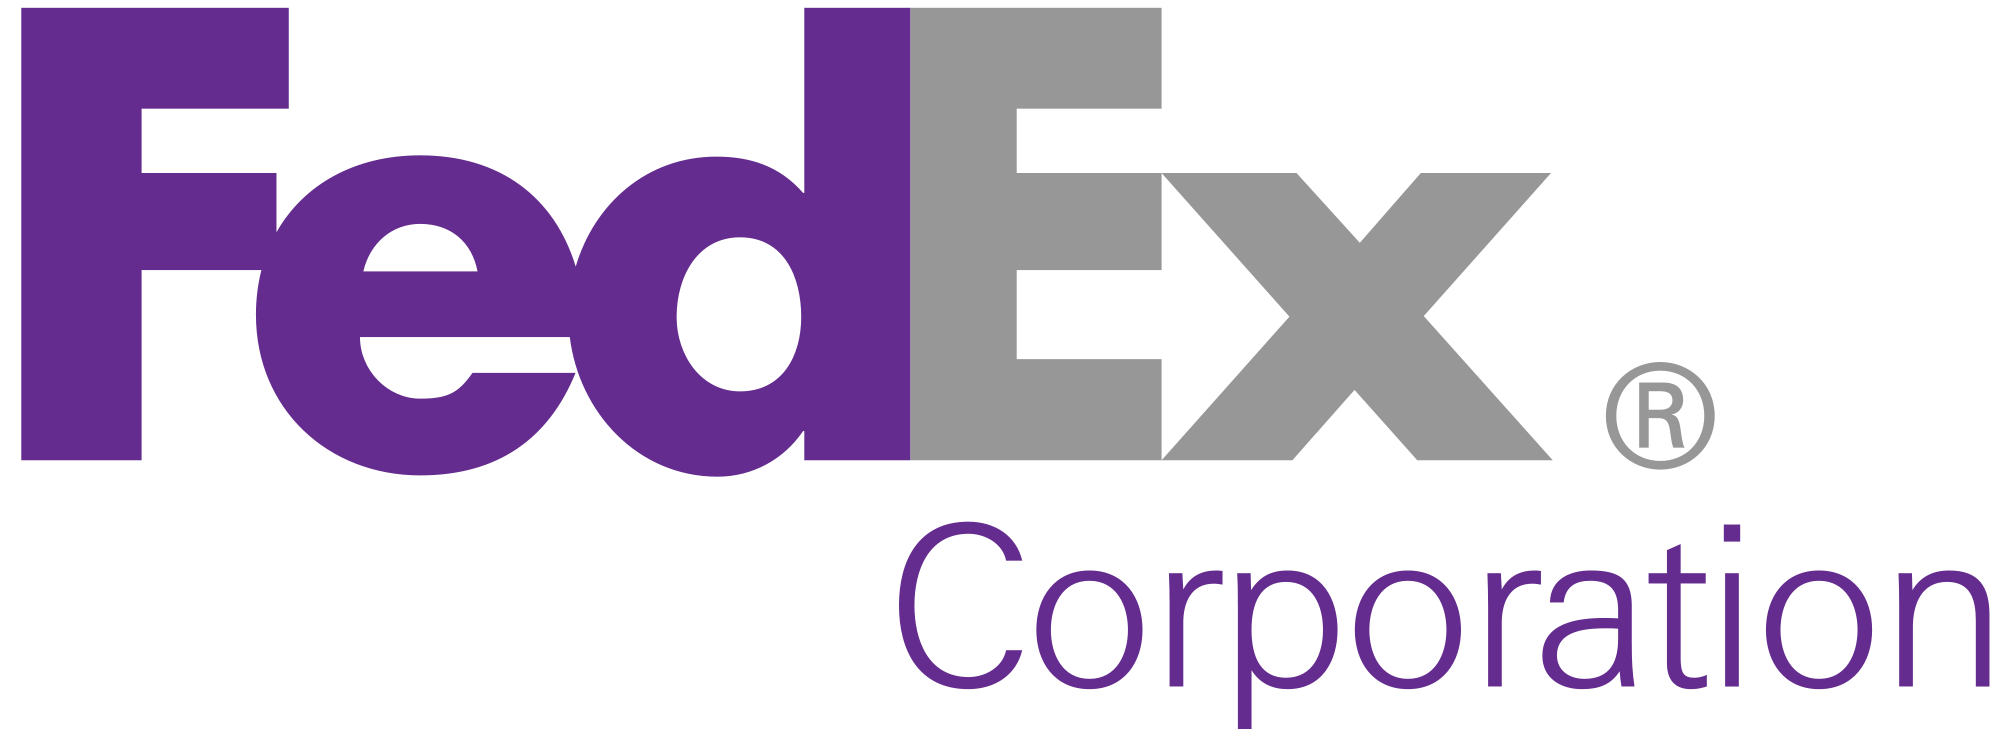 Fedex Corporation PNG